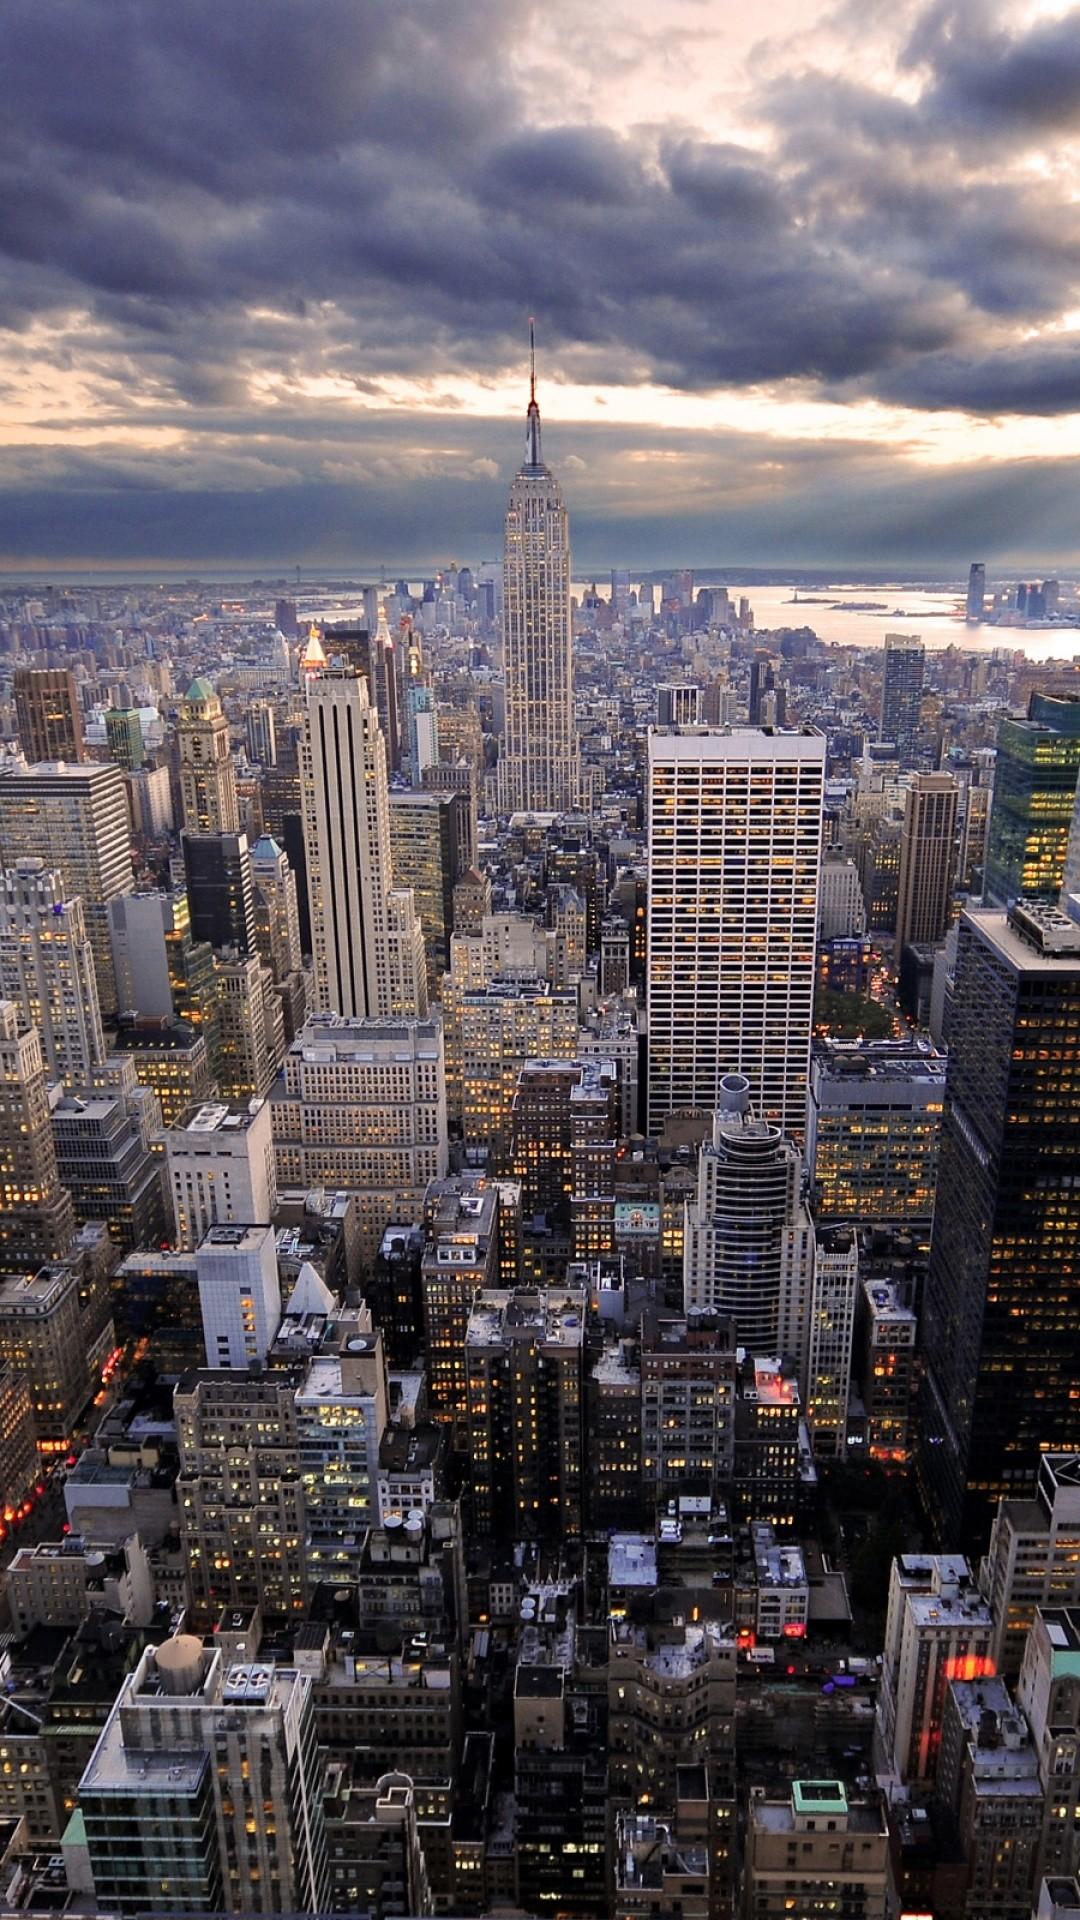 New York City Skyline Wallpaper9 1 600x338